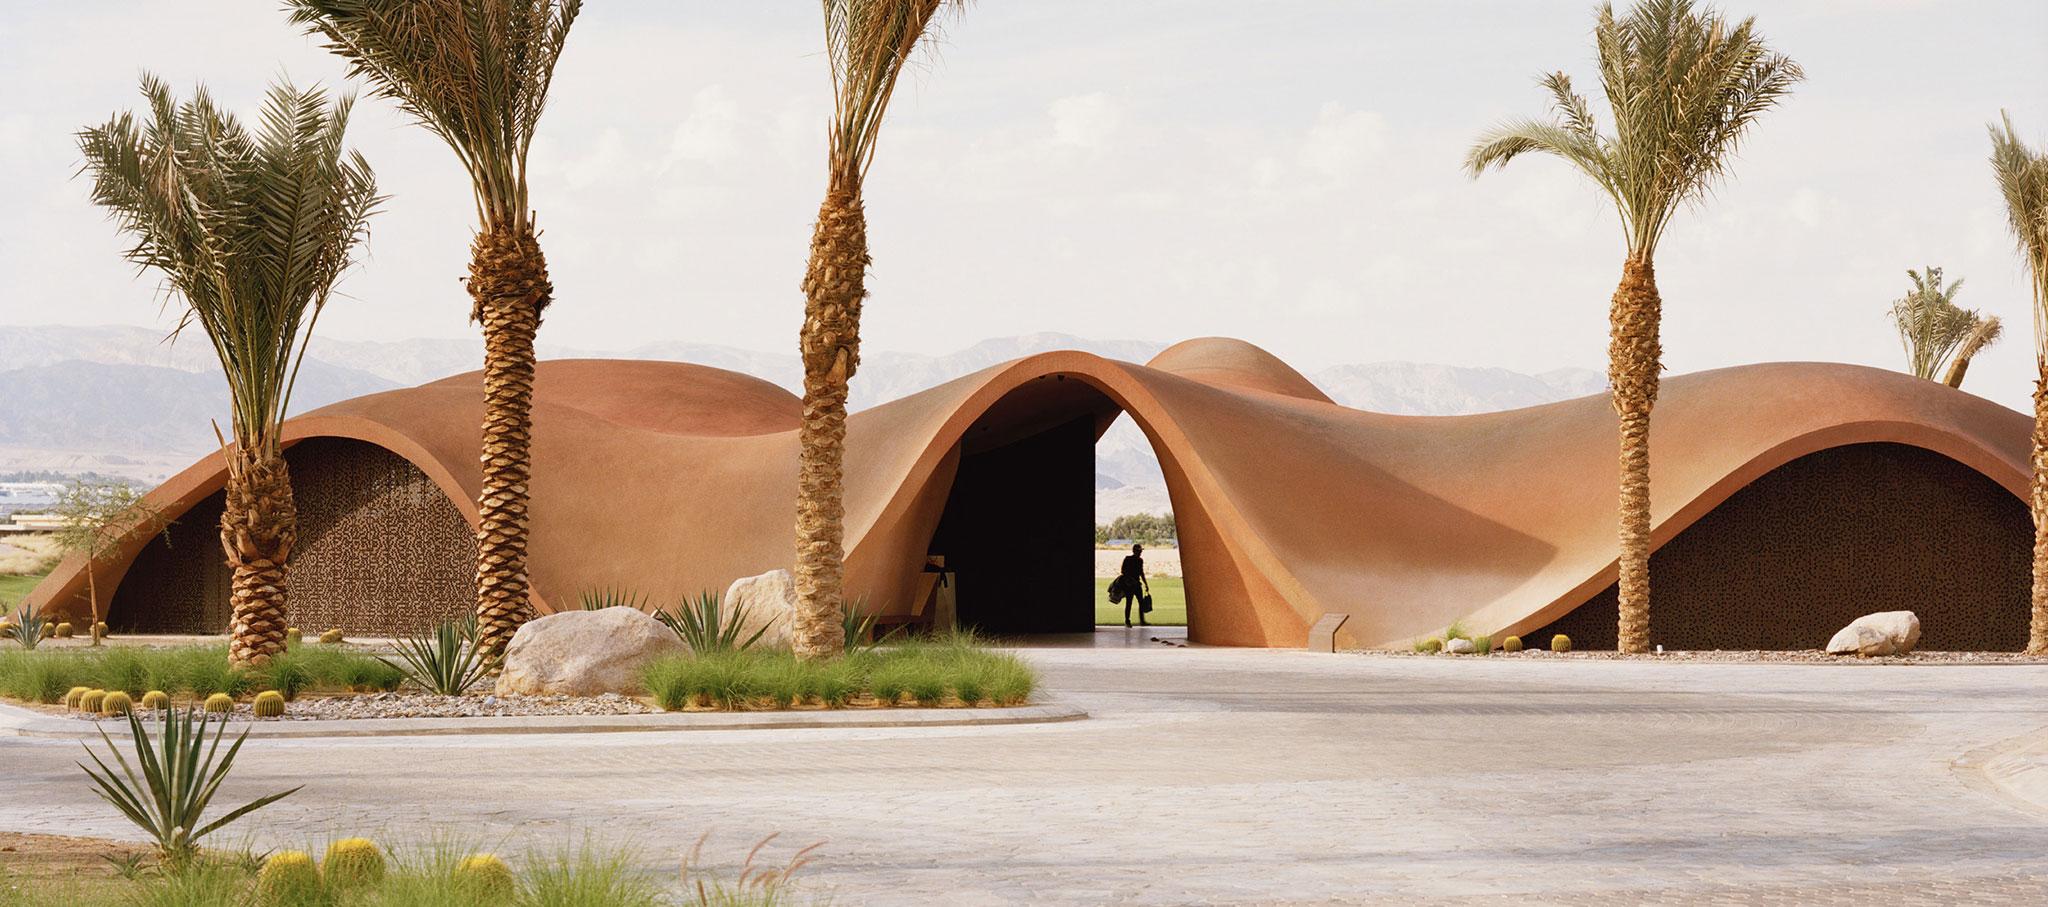 """Ayla Golfclub"" por Oppenheim Architecture. Fotografía de Rory Gardiner. © 2019 Oppenheim Architecture"